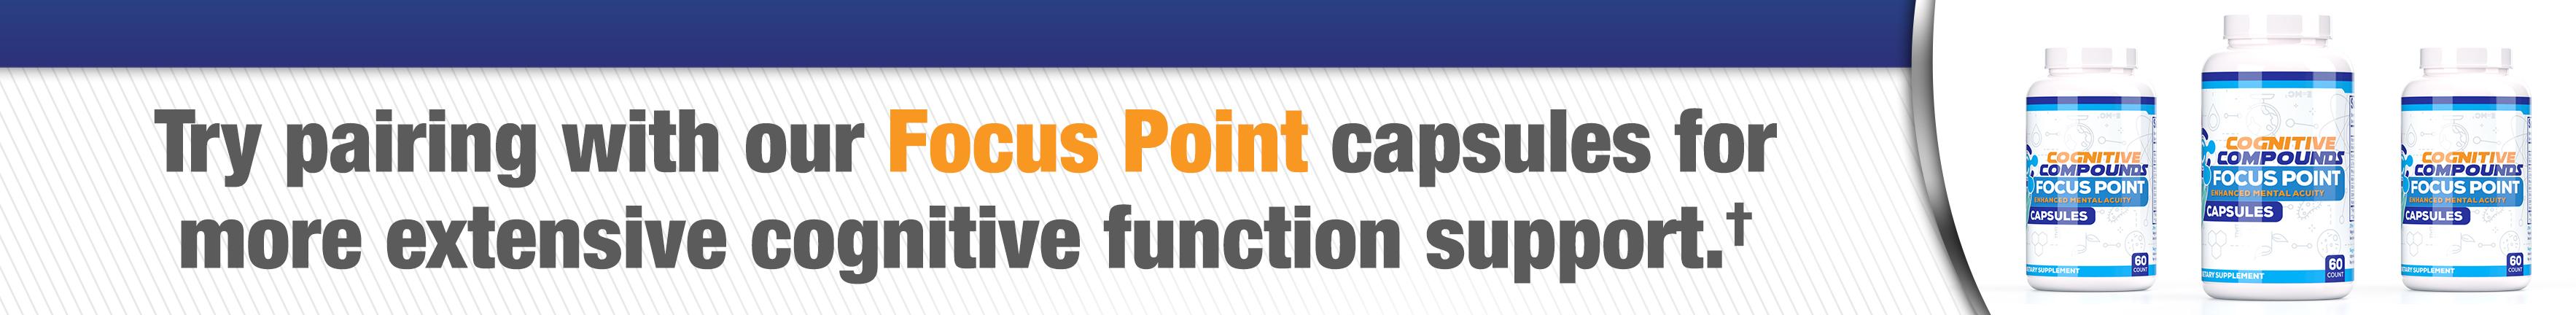 focus-point-consider-10-21.jpg